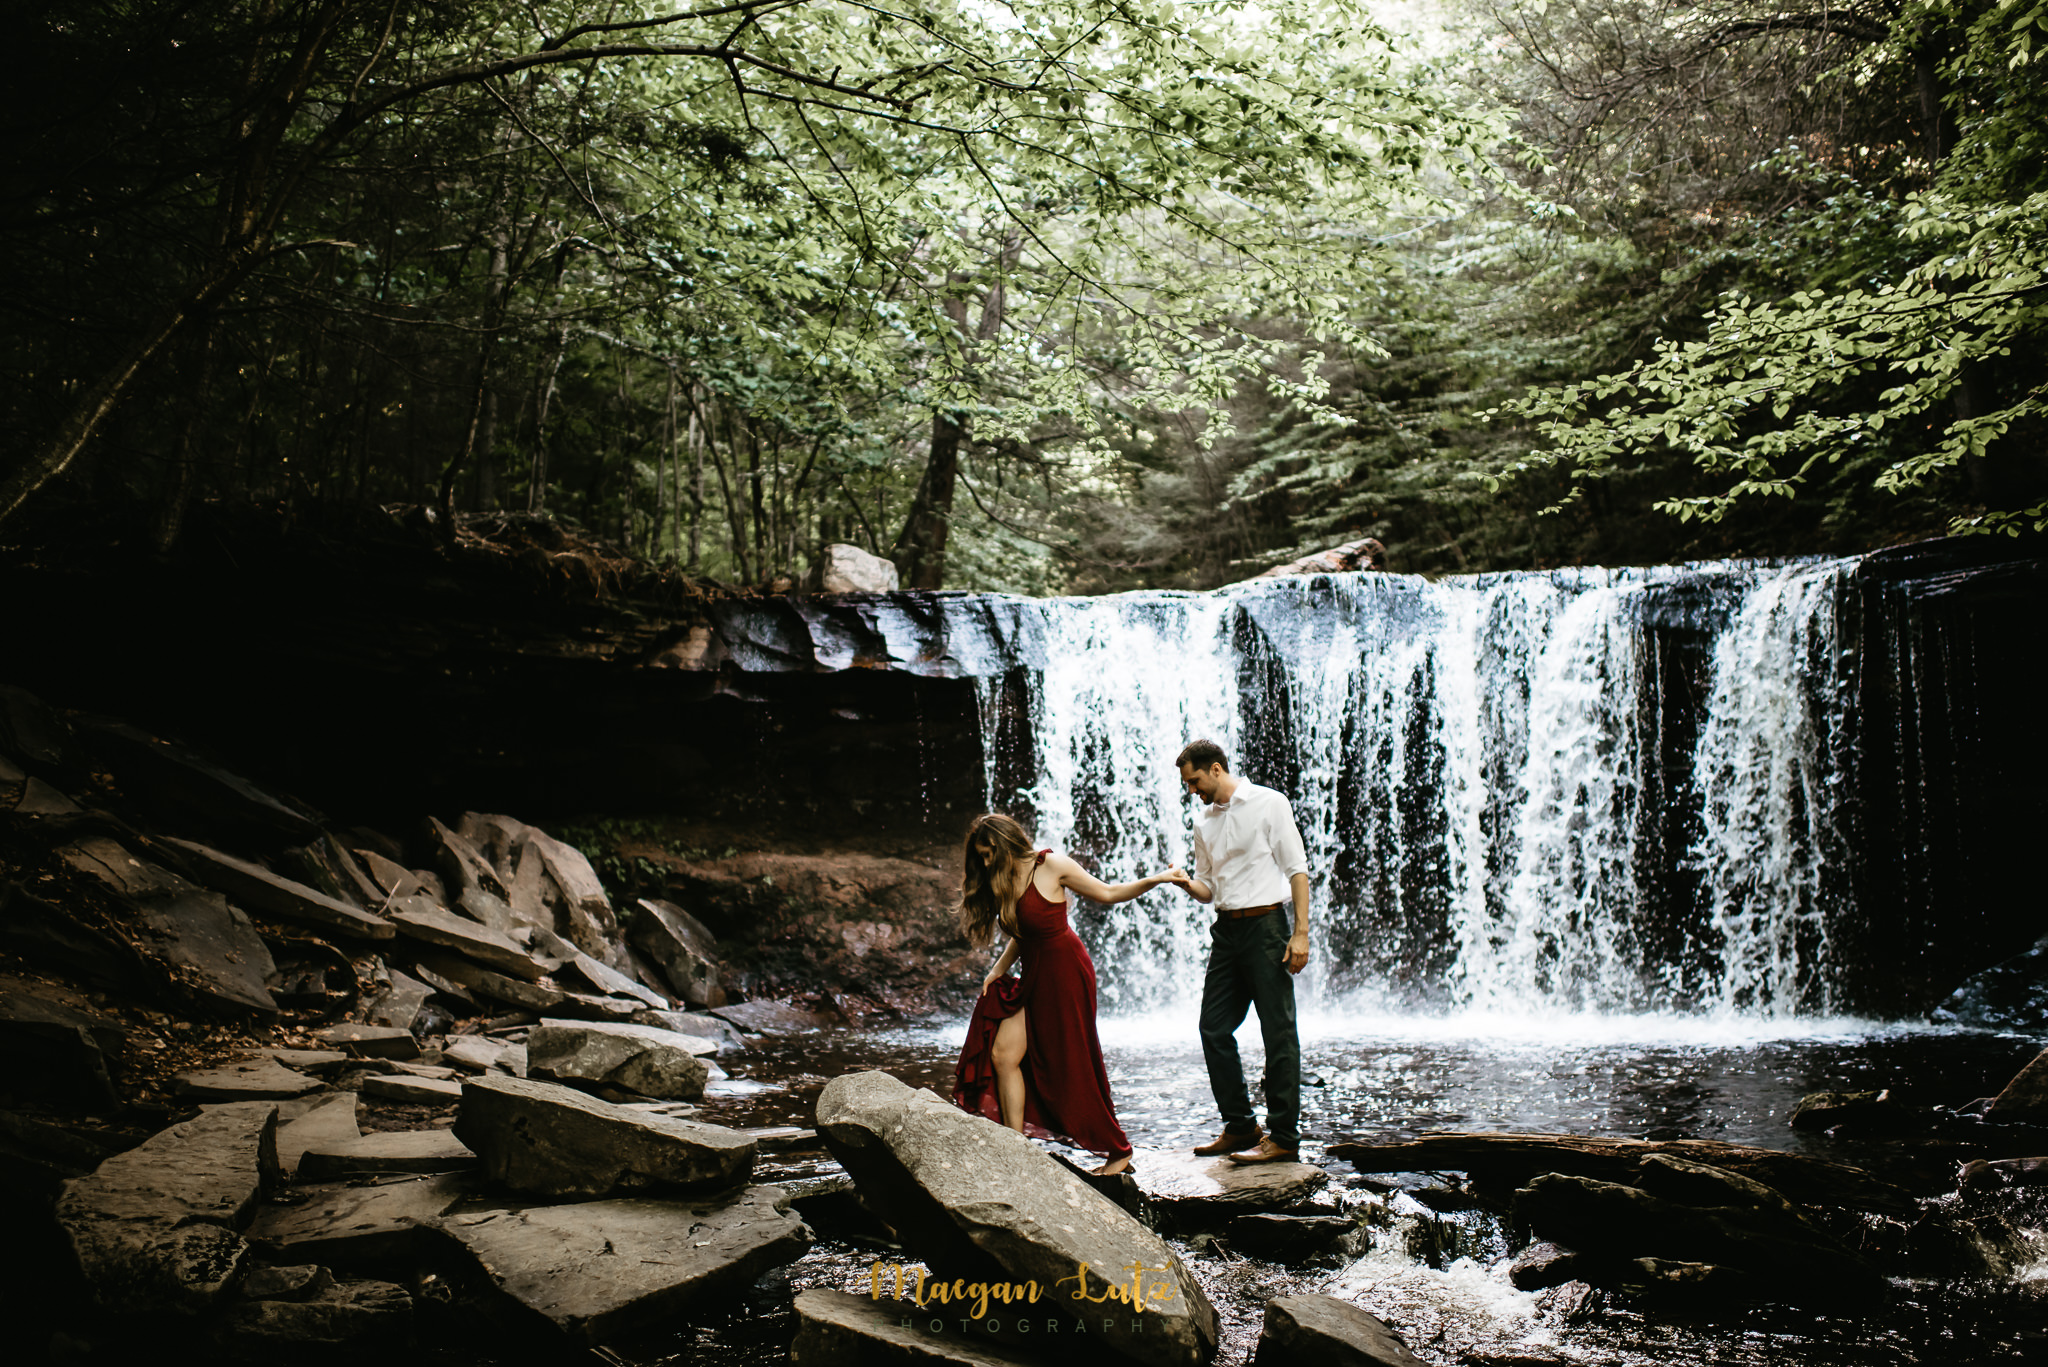 NEPA-Engagement-Wedding-Photographer-Session-at-Ricketts-Glen-State-Park-15.jpg